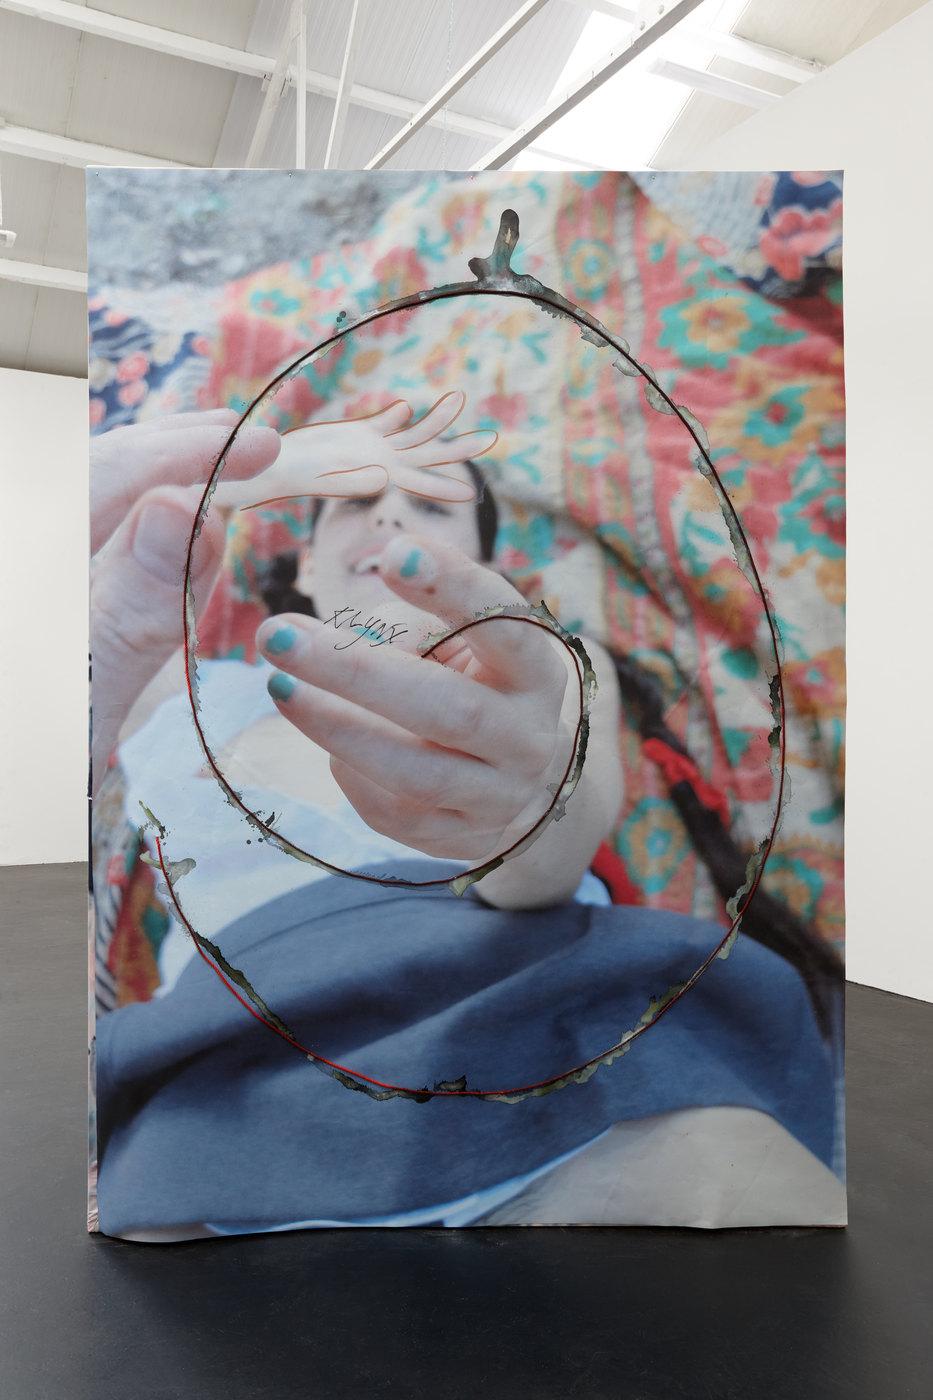 01.-Nora-Berman-Enter-me-klynx-2016-ii